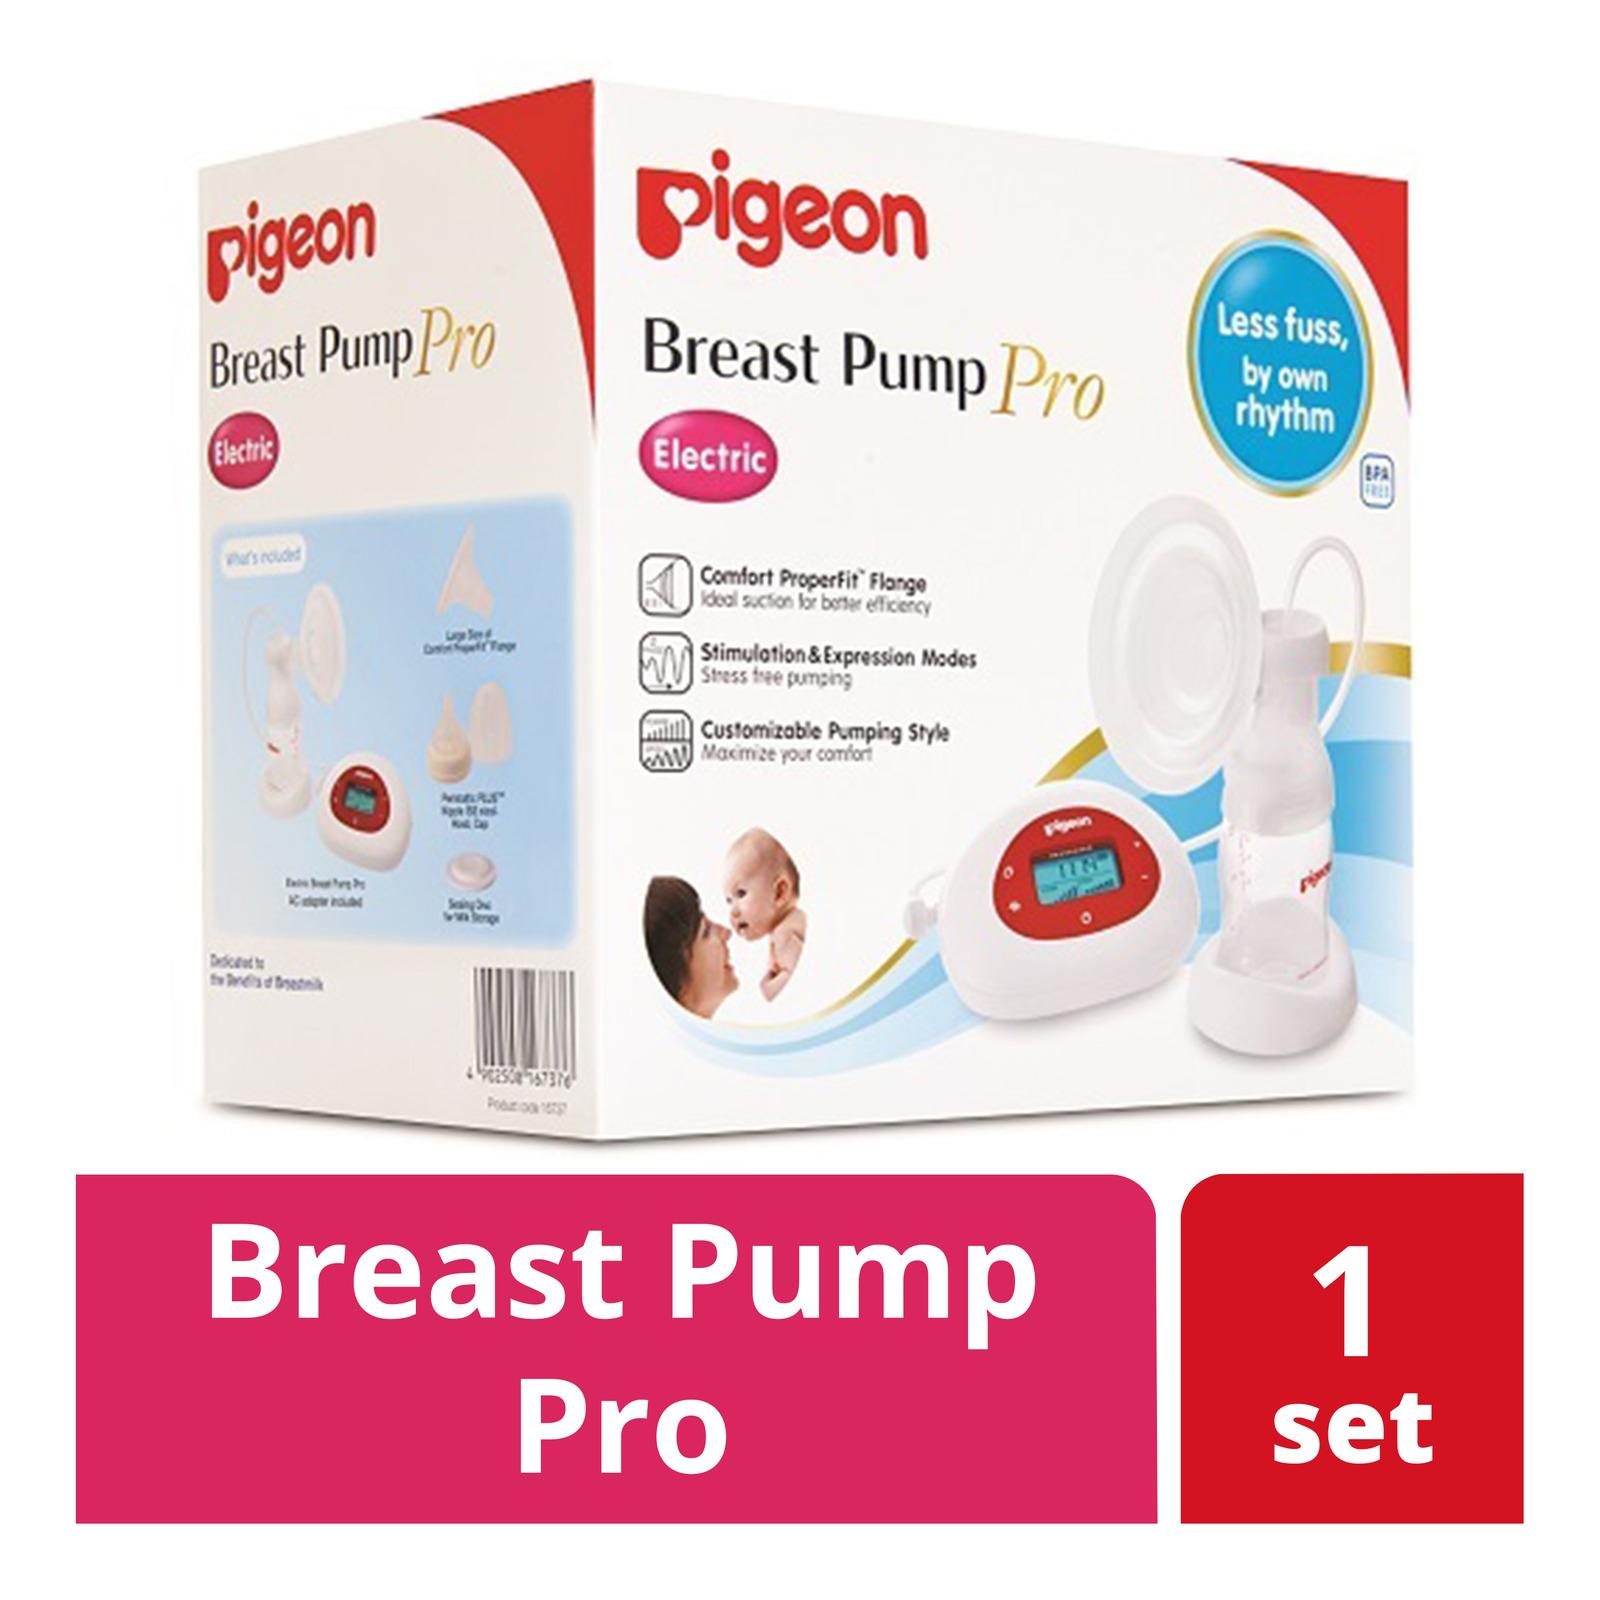 Pigeon Electric Breast Pump Pro